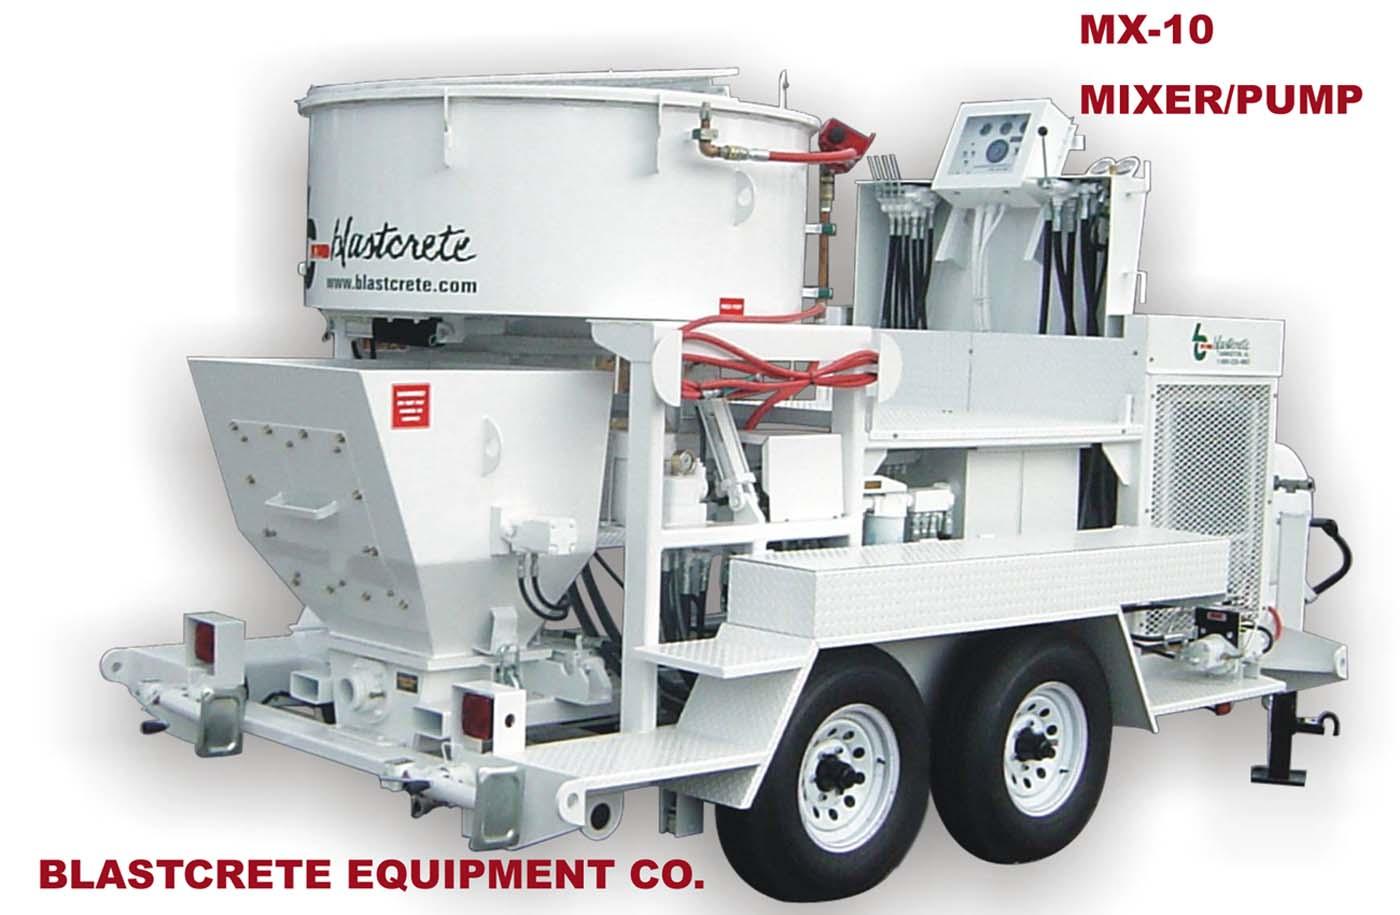 MX-10 Refractory spraying mixer/pump